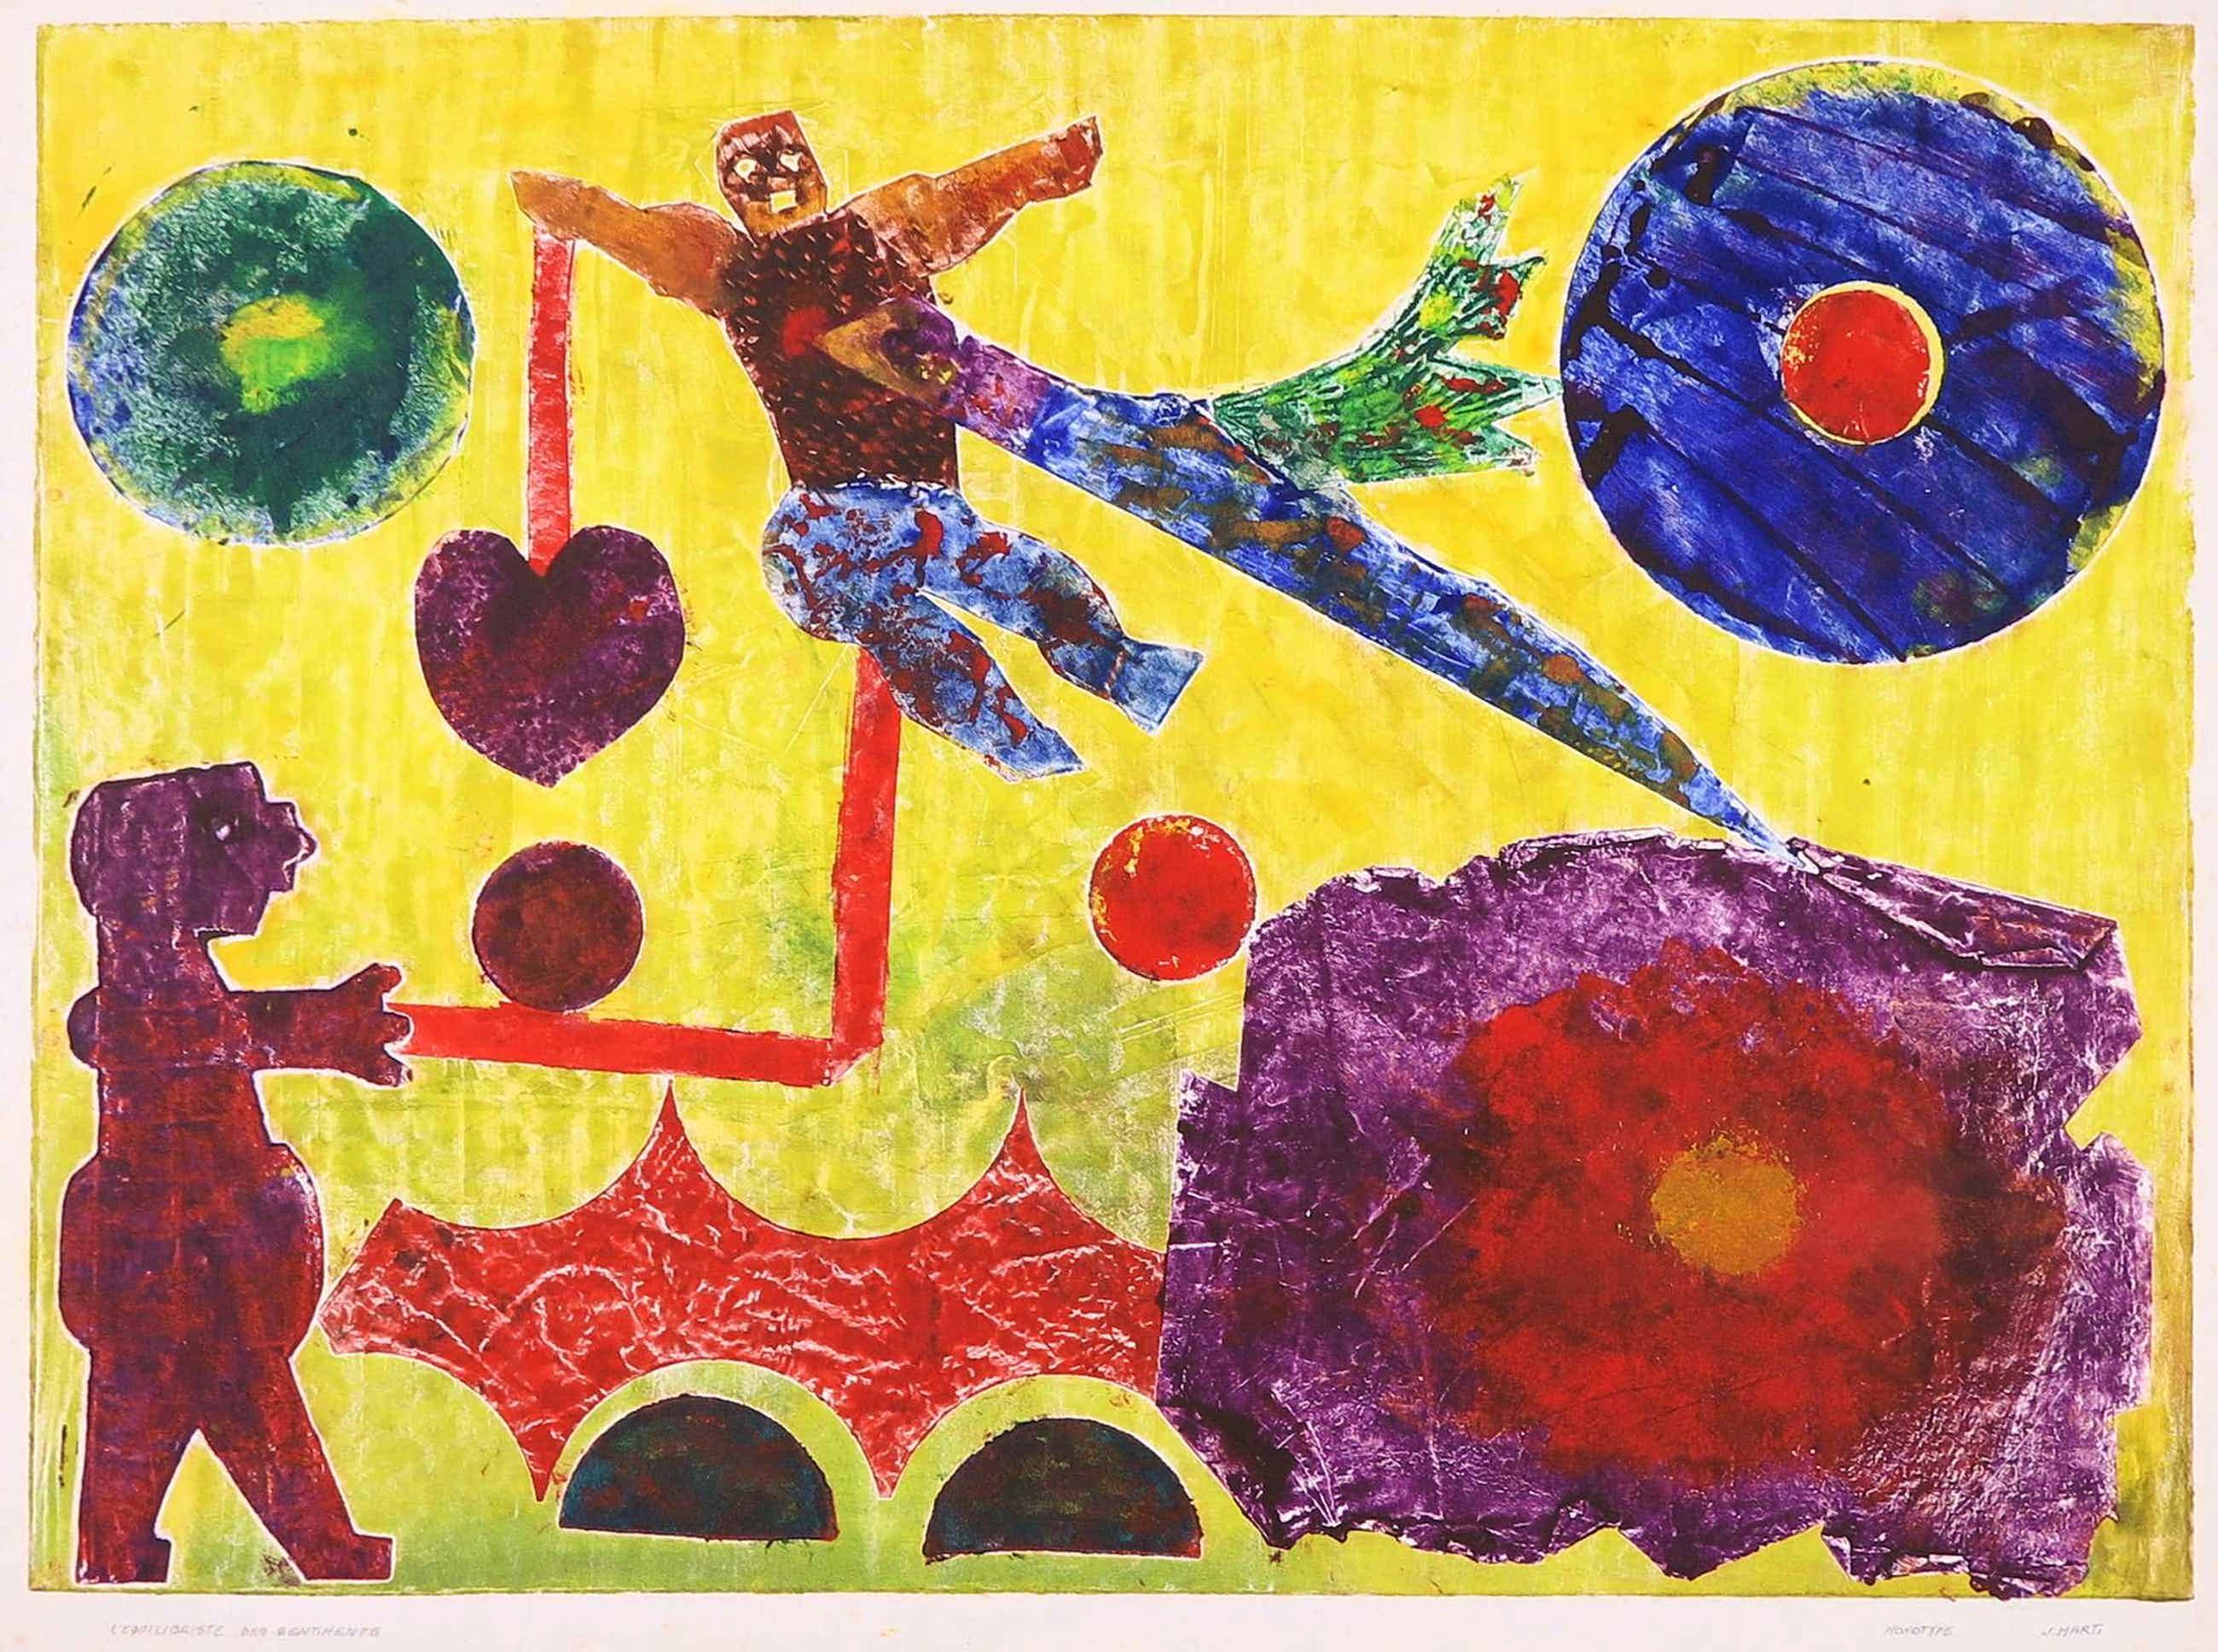 Juan Marti - Monotype, L'equilibriste des sentiments kopen? Bied vanaf 30!